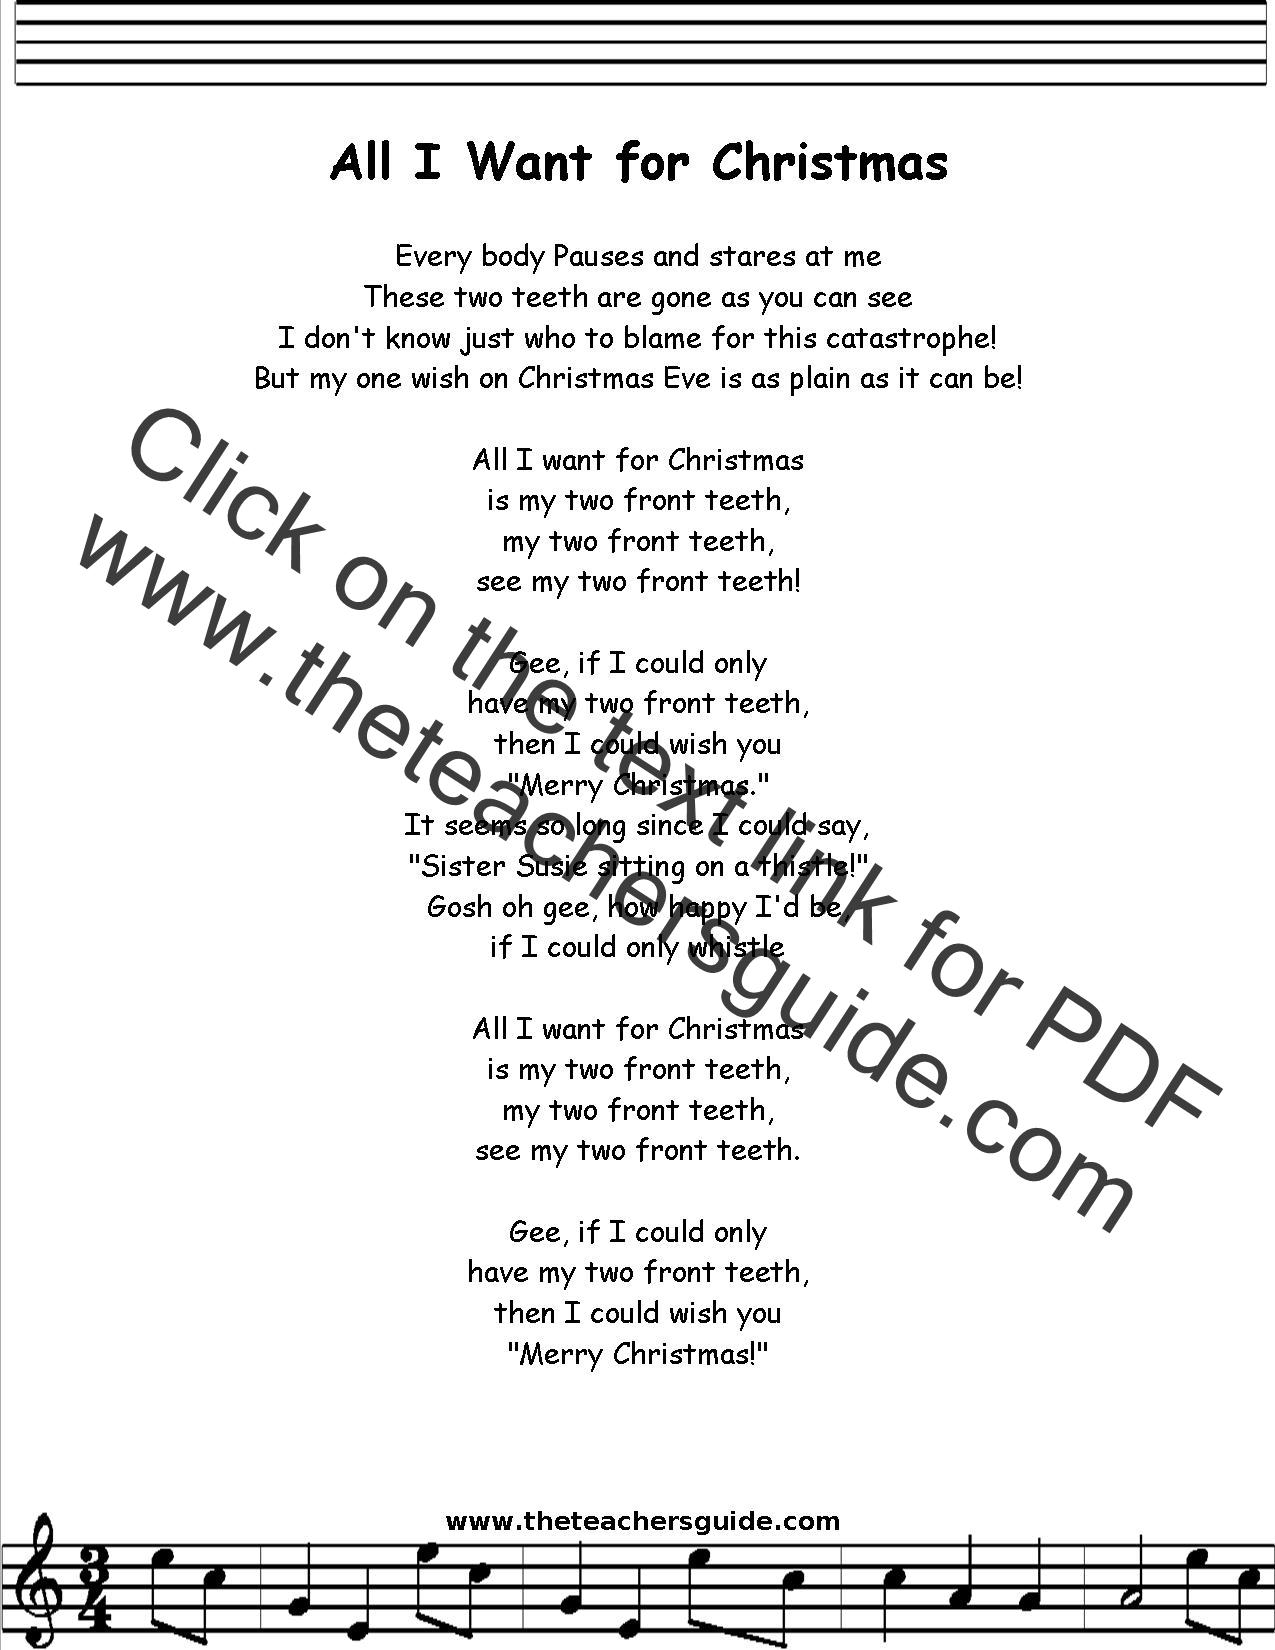 All I Want For Christmas Lyrics Printout Midi And Video